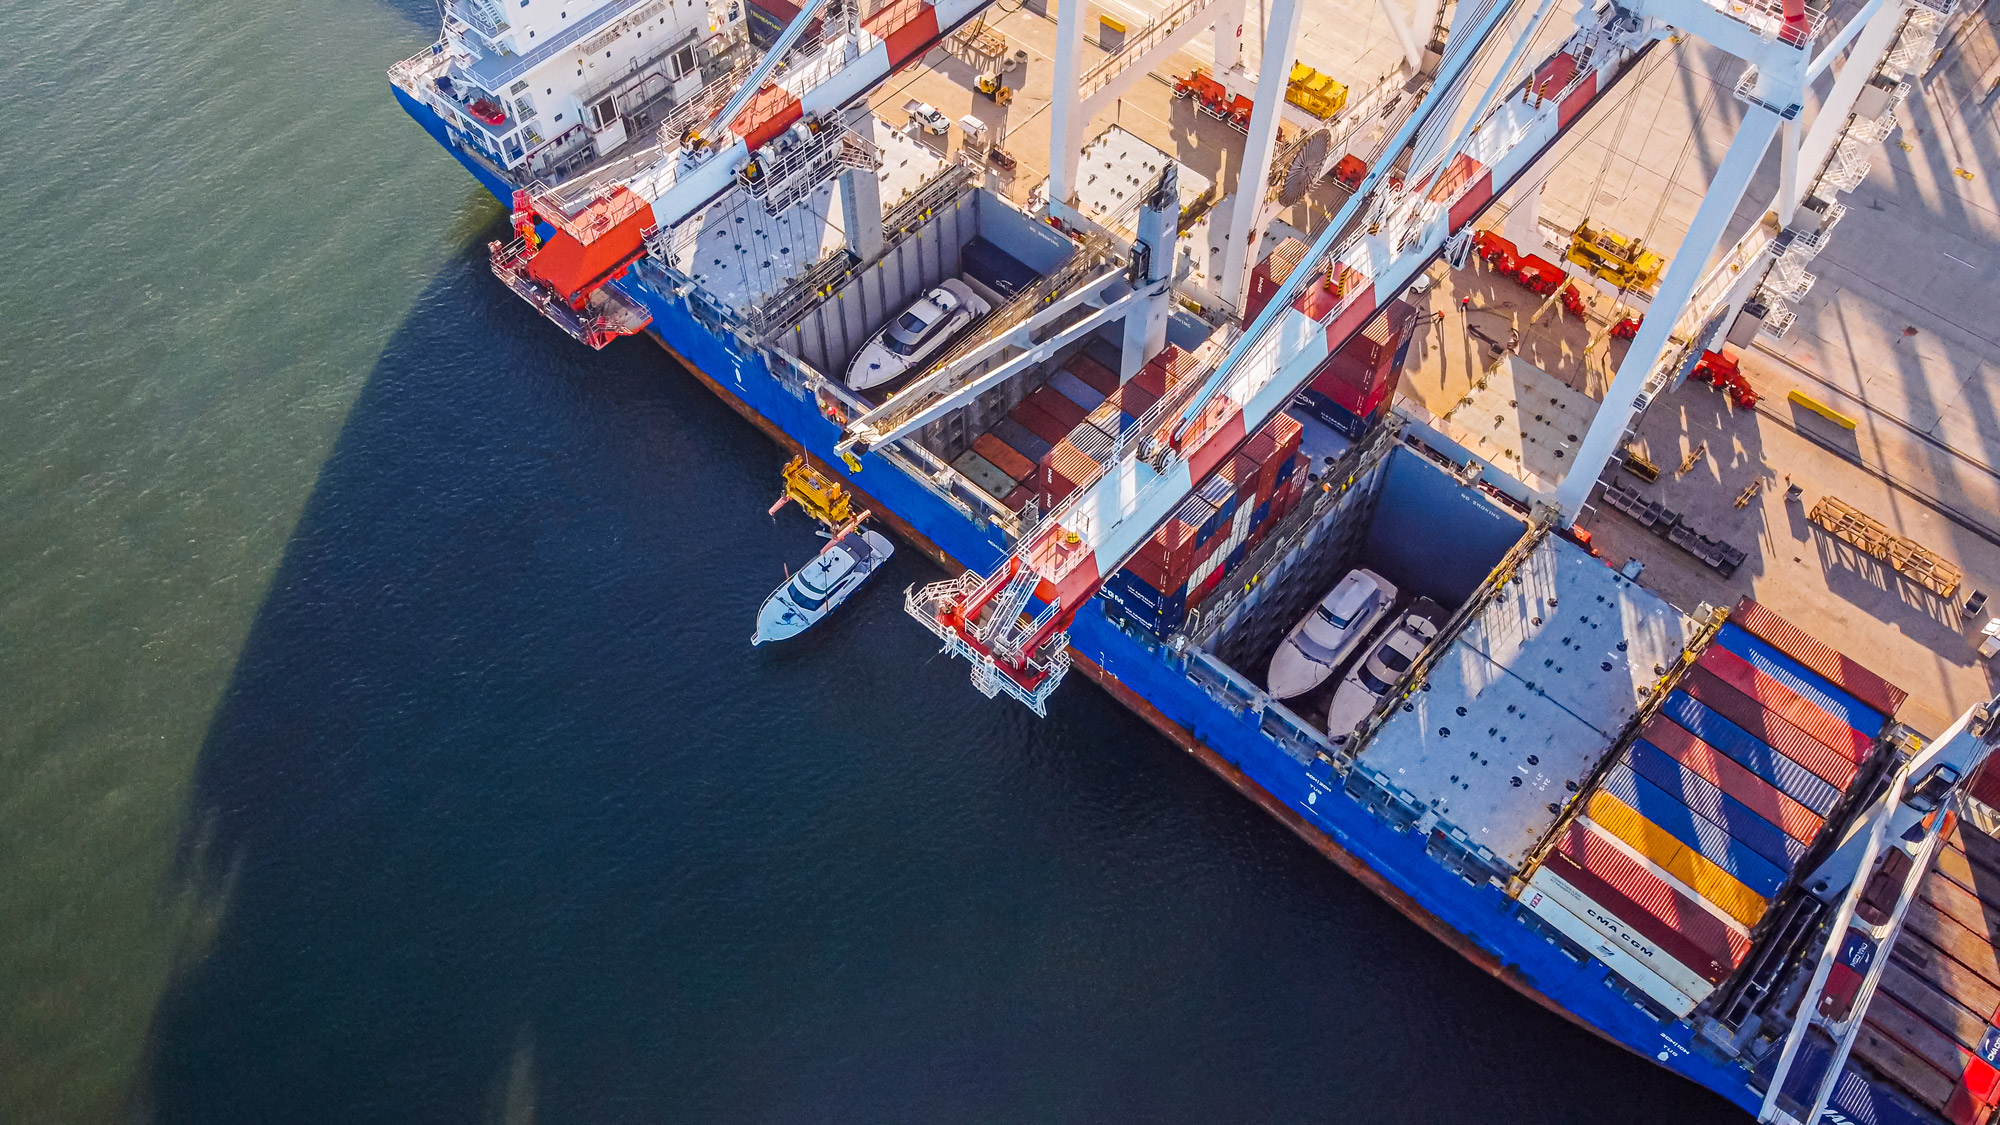 Riviera Australia Ship Loading aerial